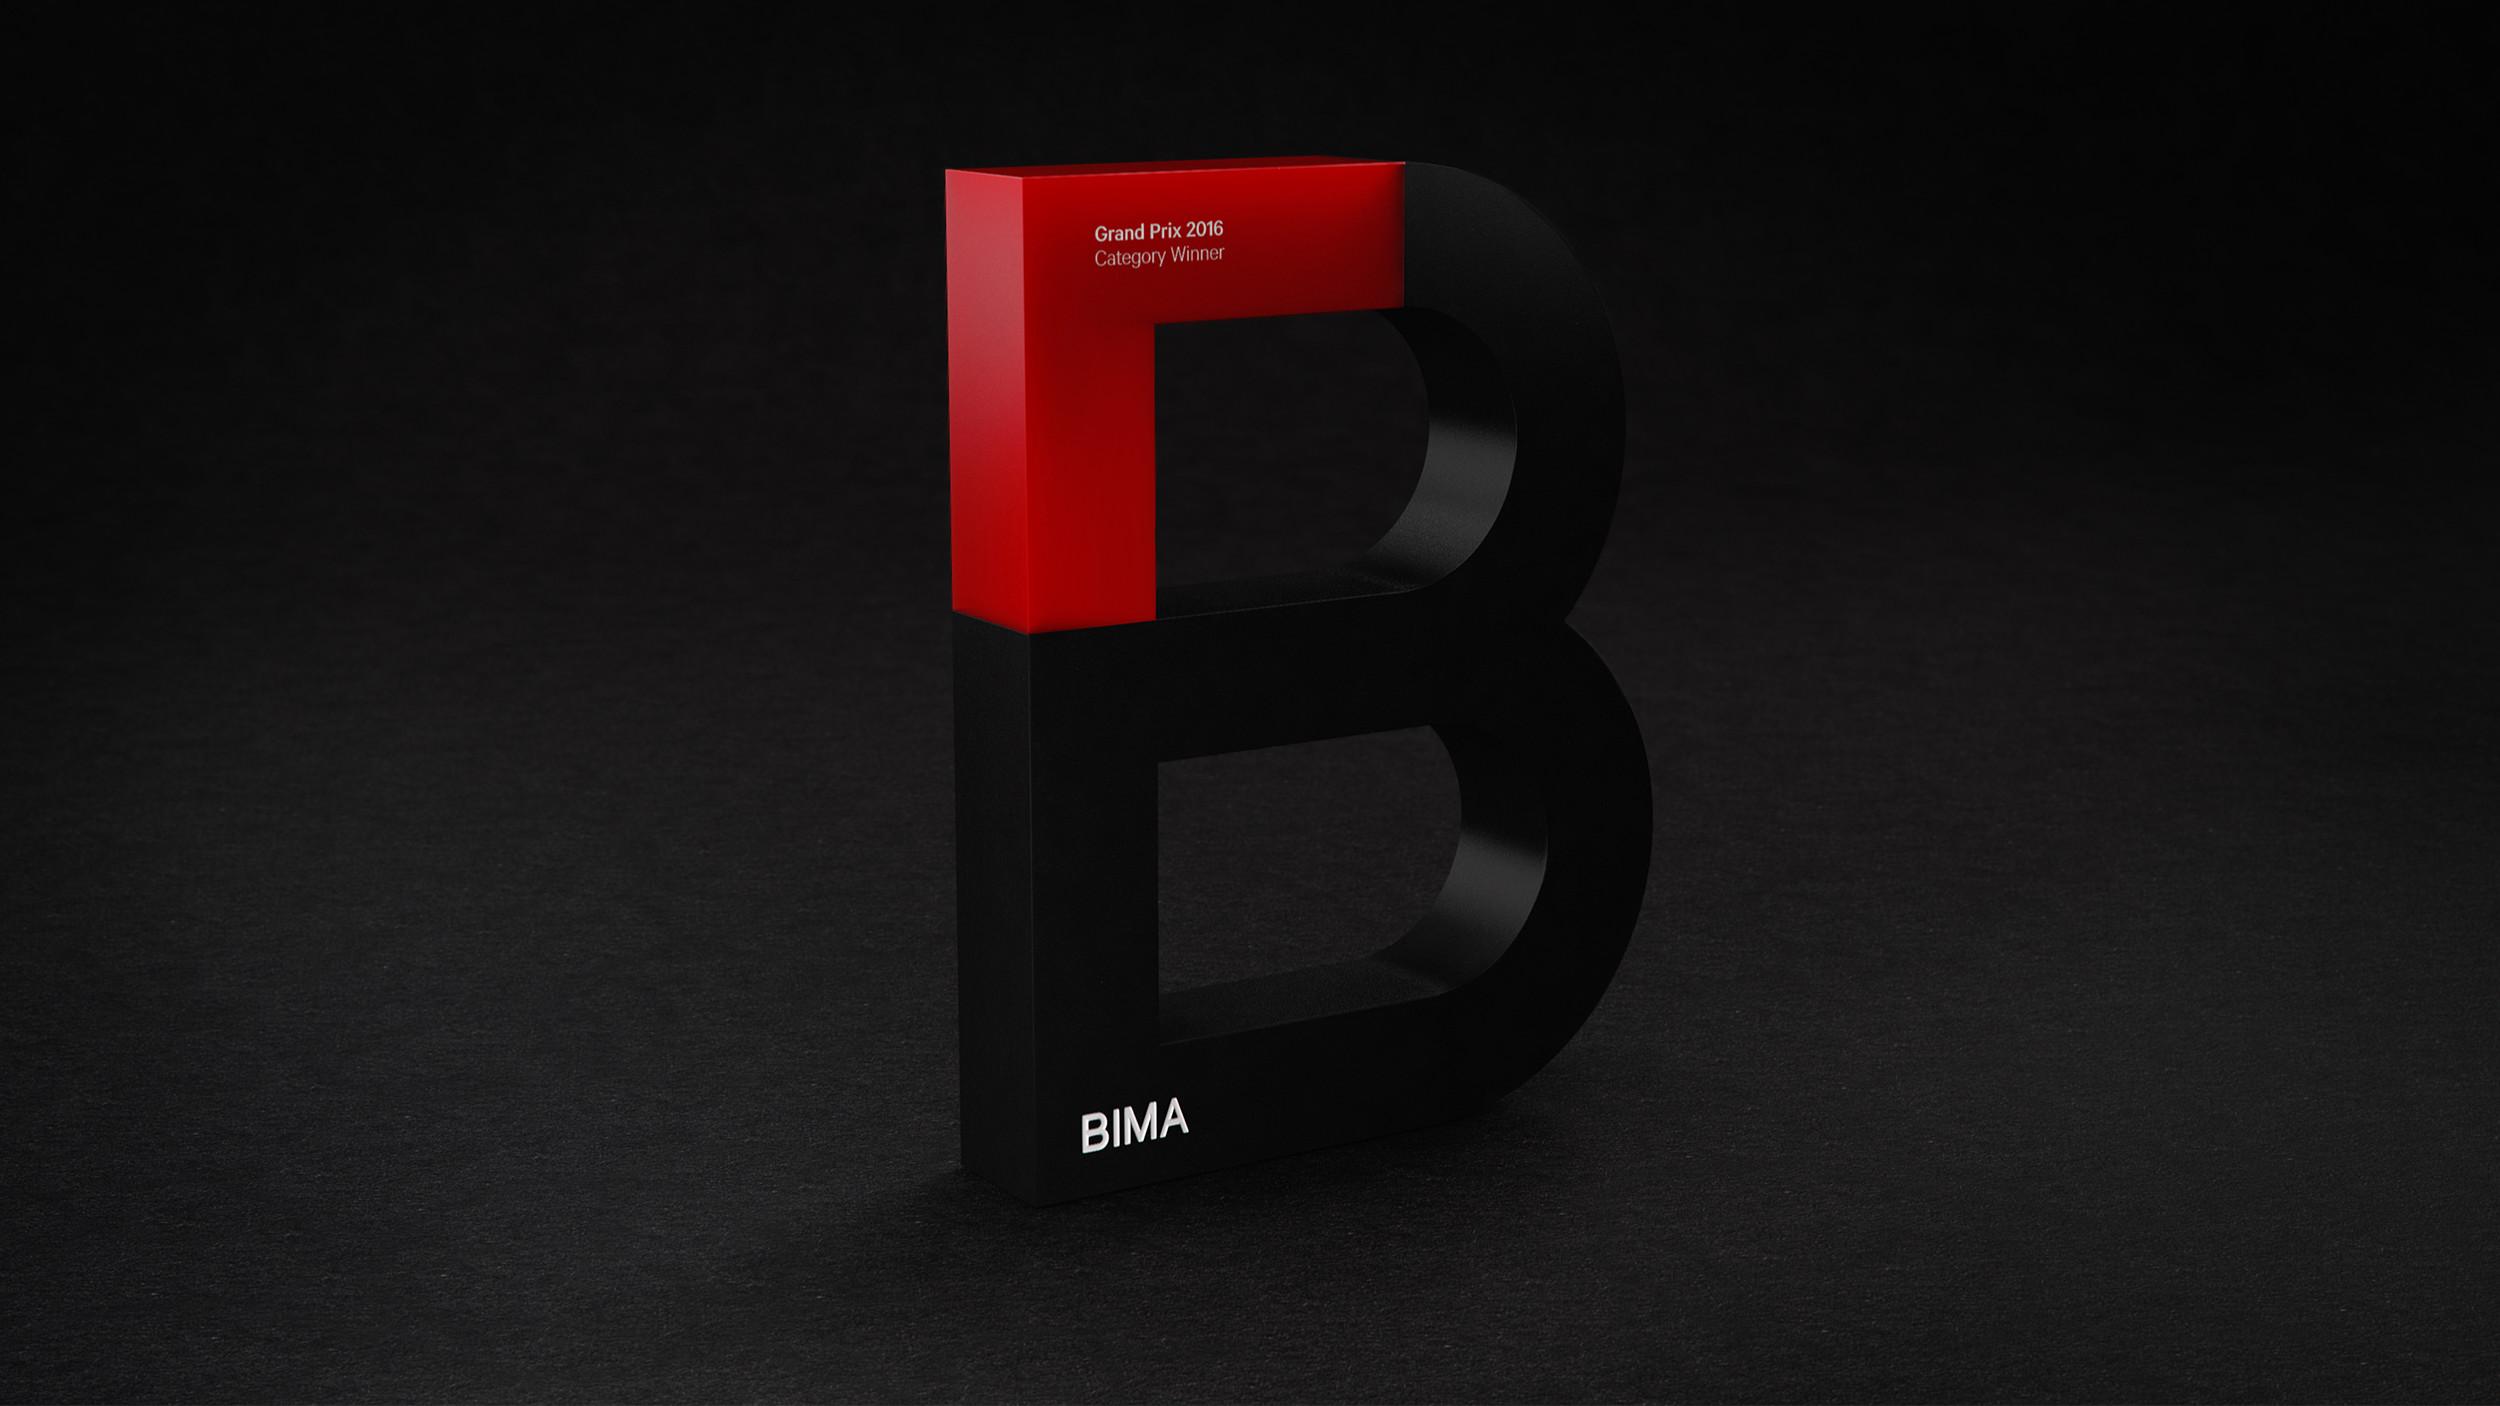 6 BIMA Trophy